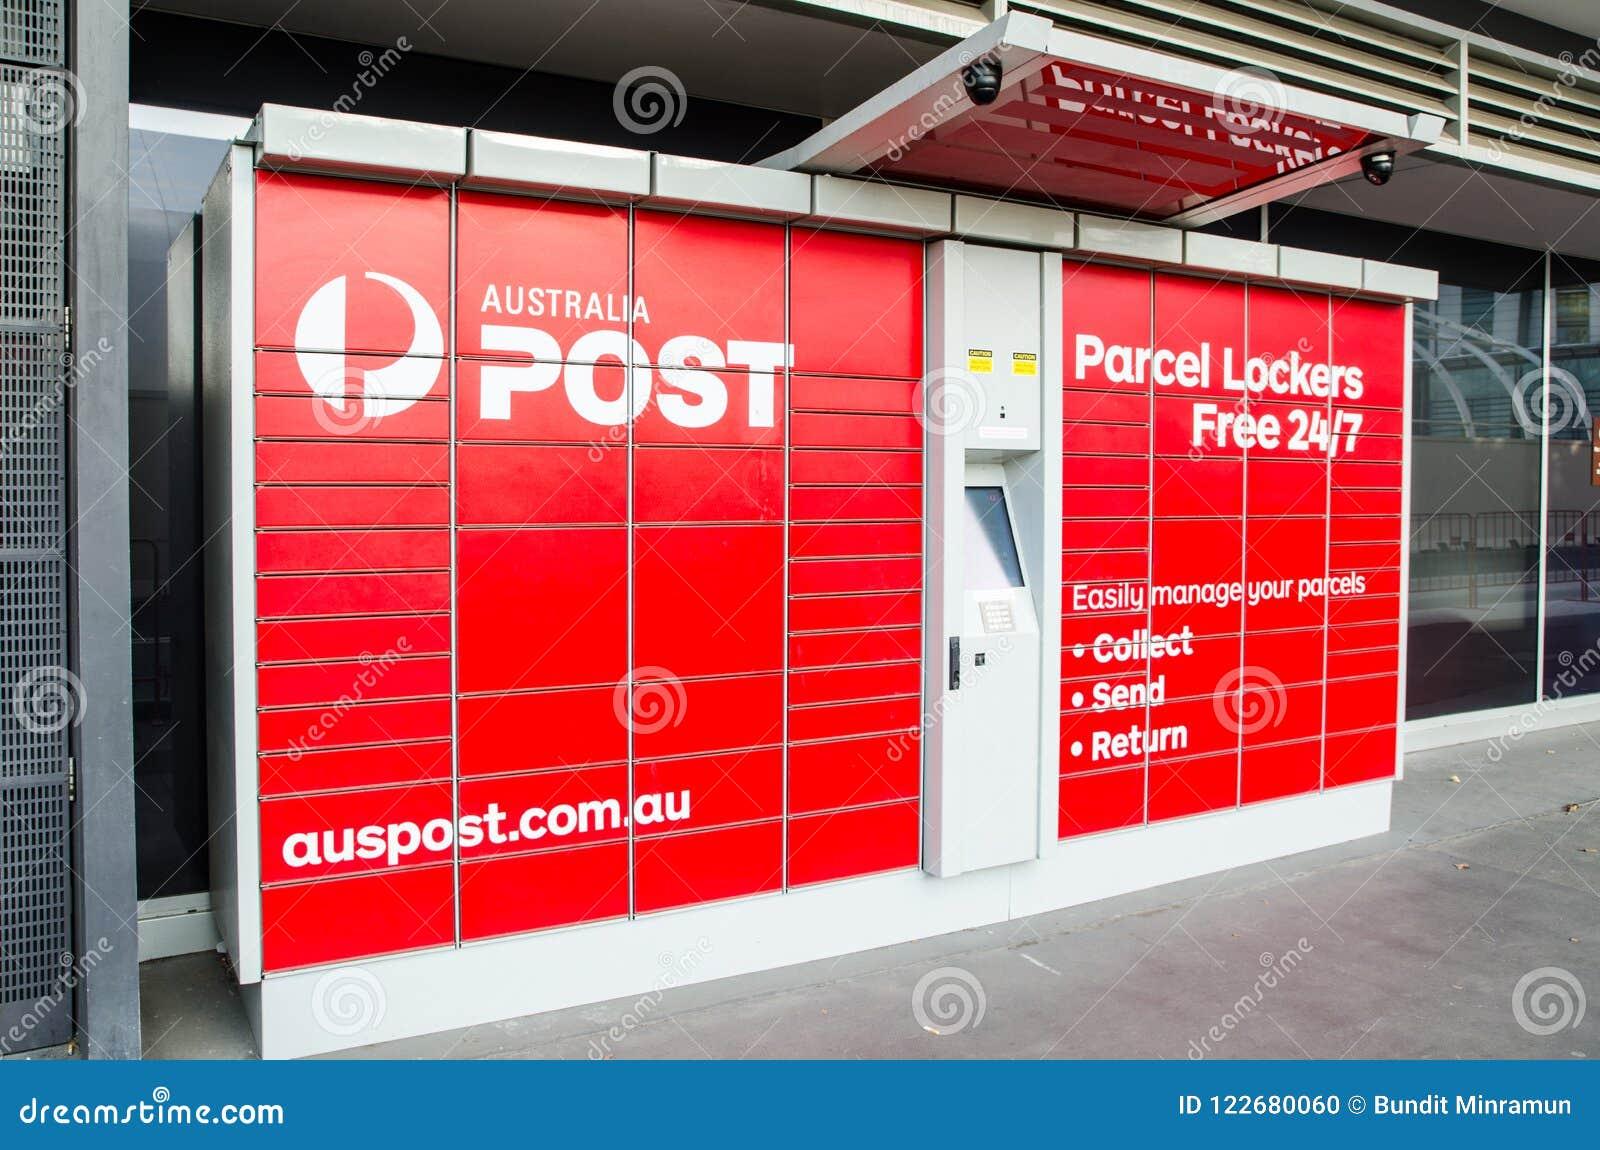 Australia Post Parcel Lockers For Collecting, Sending